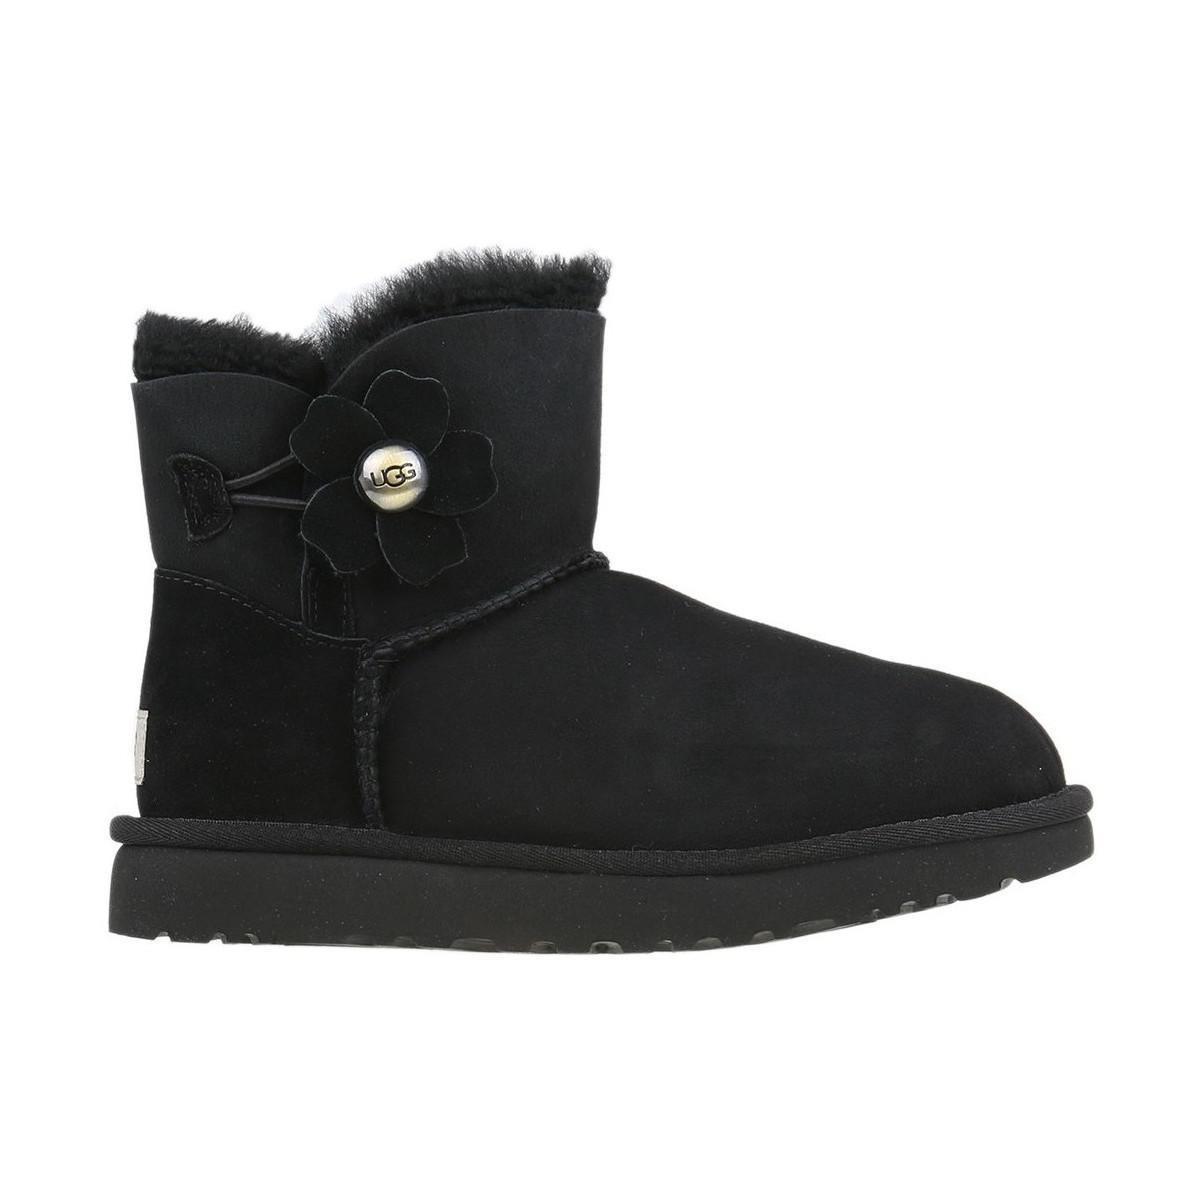 131a599e643 UGG Mini Bailey Button Poppy Women's Snow Boots In Black in Black - Lyst